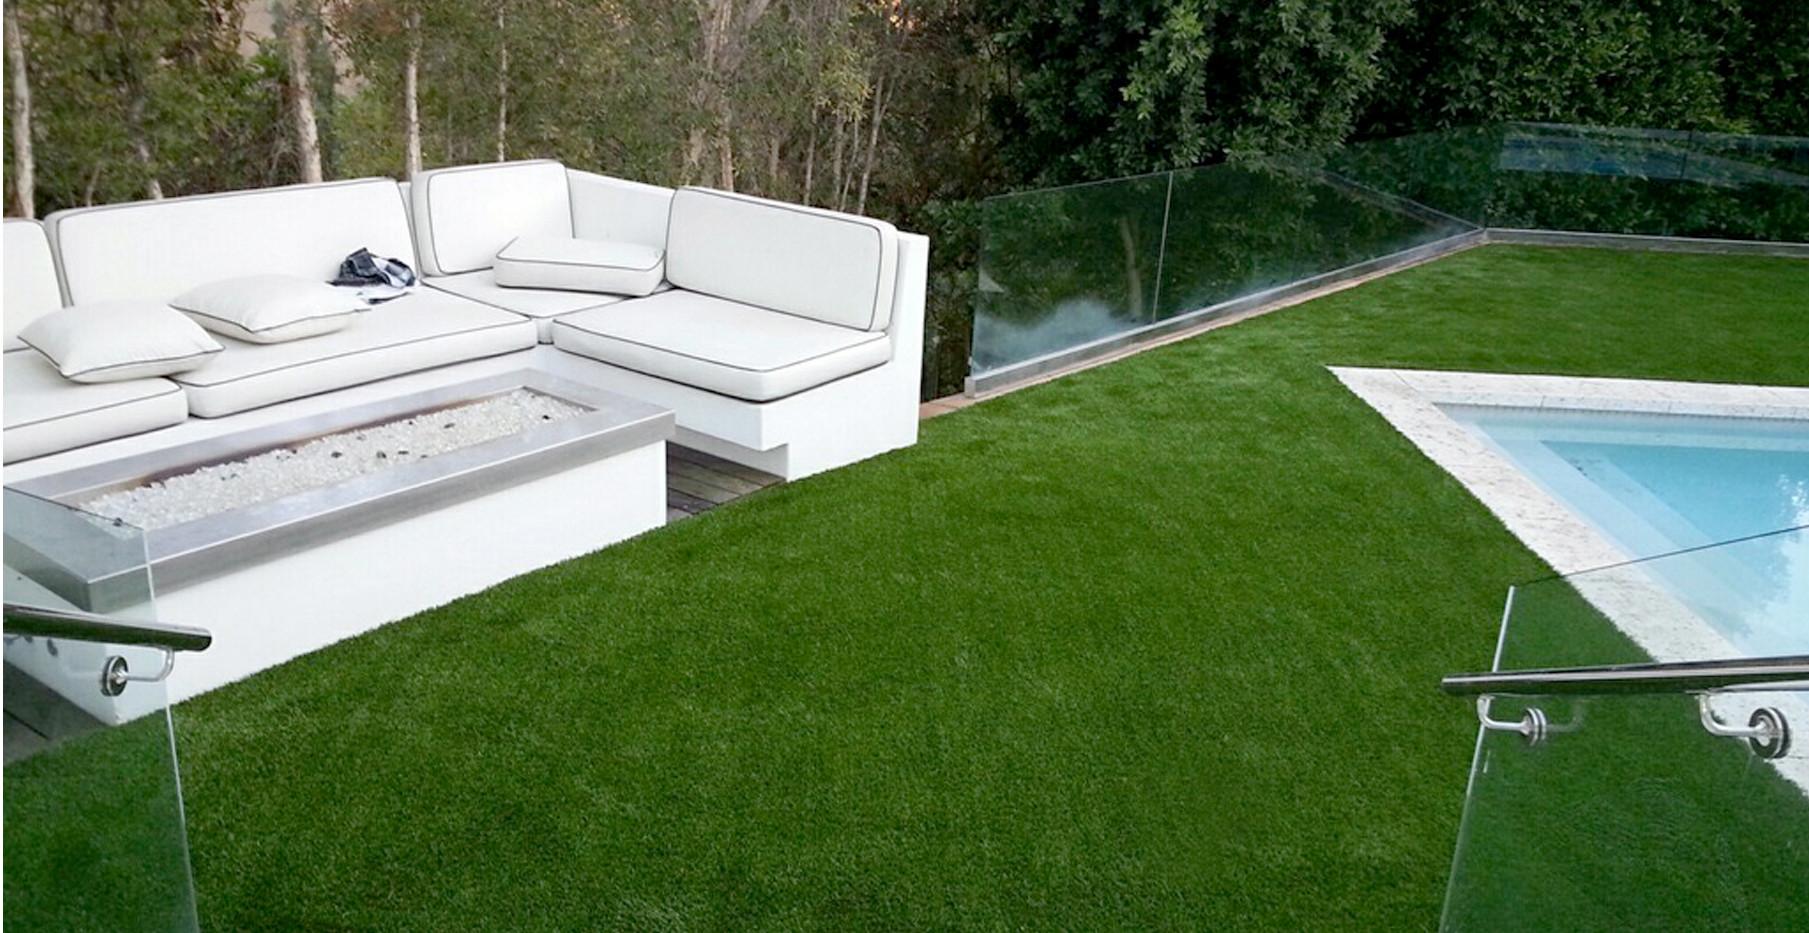 lounge_patiograss.jpg